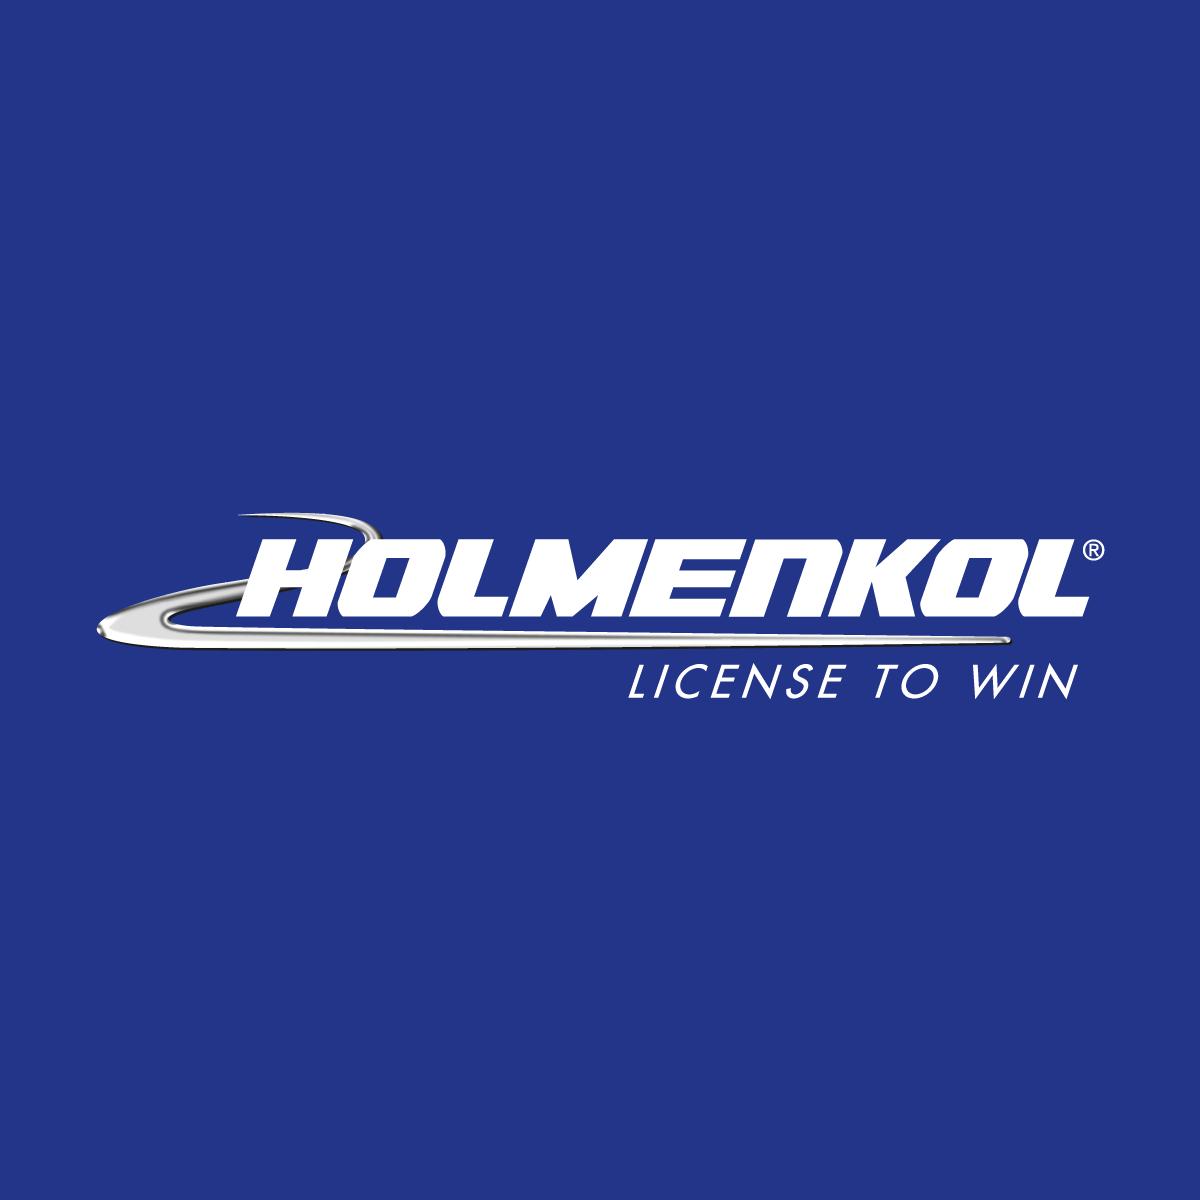 https://www.inasport.cz/media/tmp/Holmenkol_logo.png